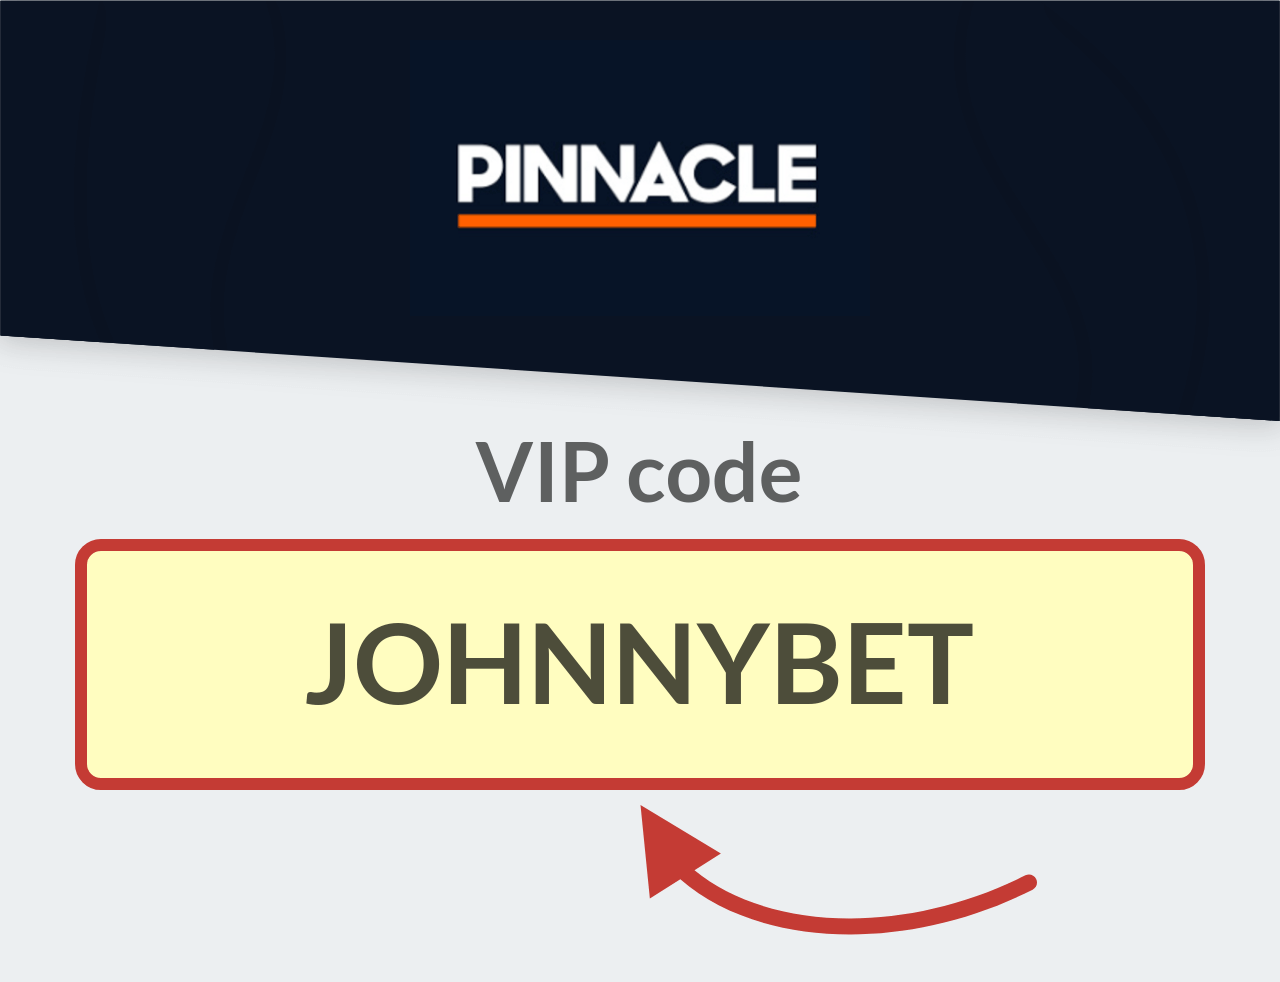 Pinnacle Kód VIP